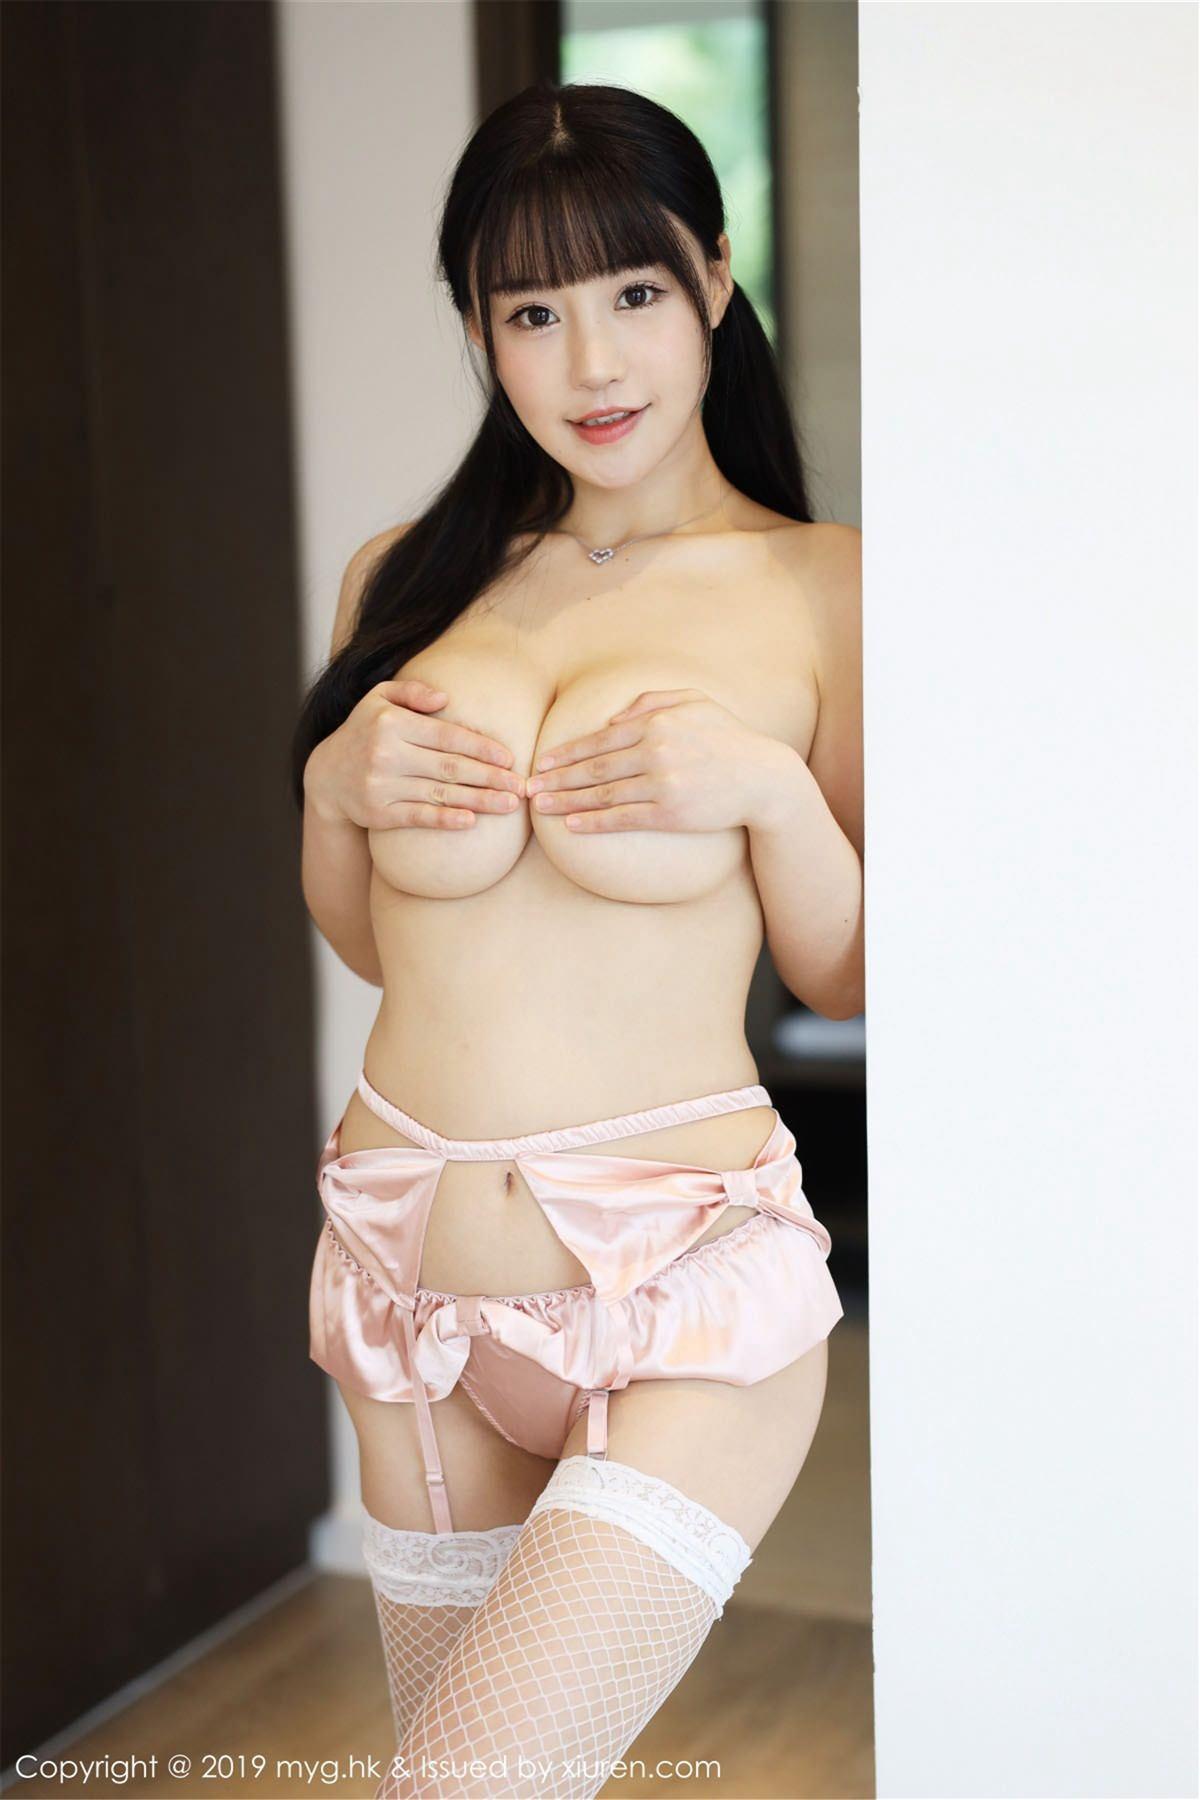 MyGirl Vol.365 41P, mygirl, Zhu Ke Er